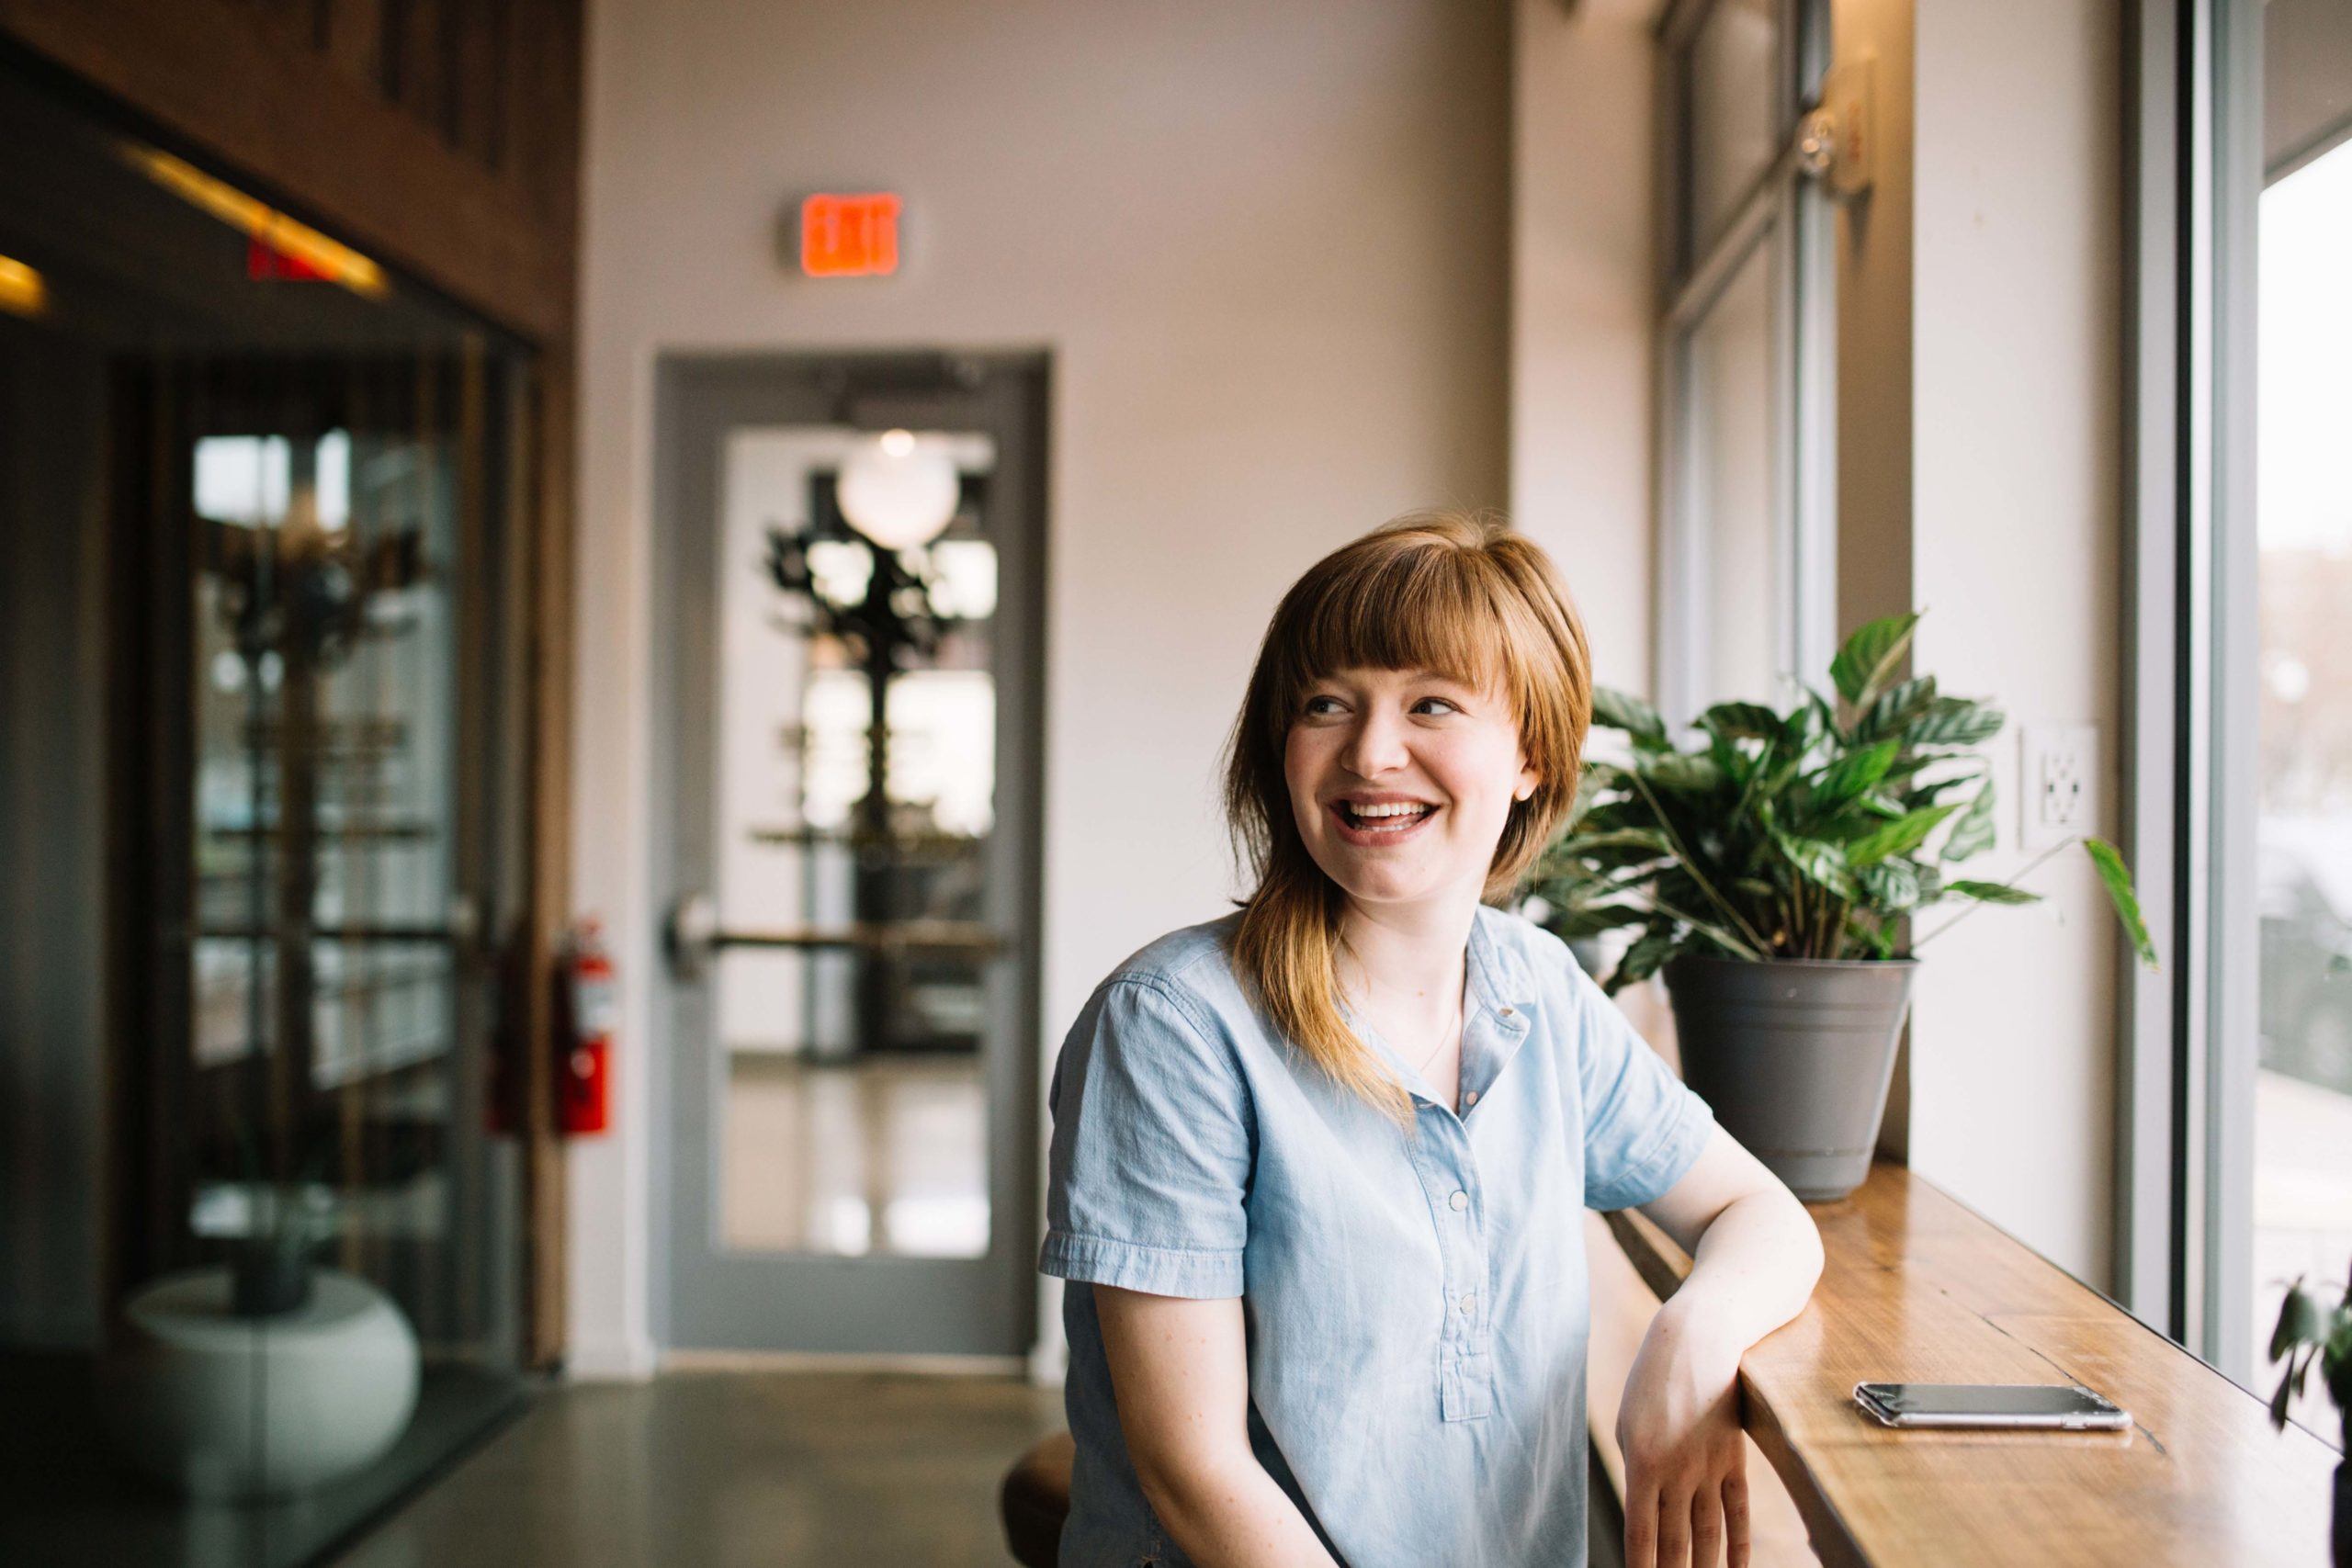 Thriving at Work – Lisa's Story